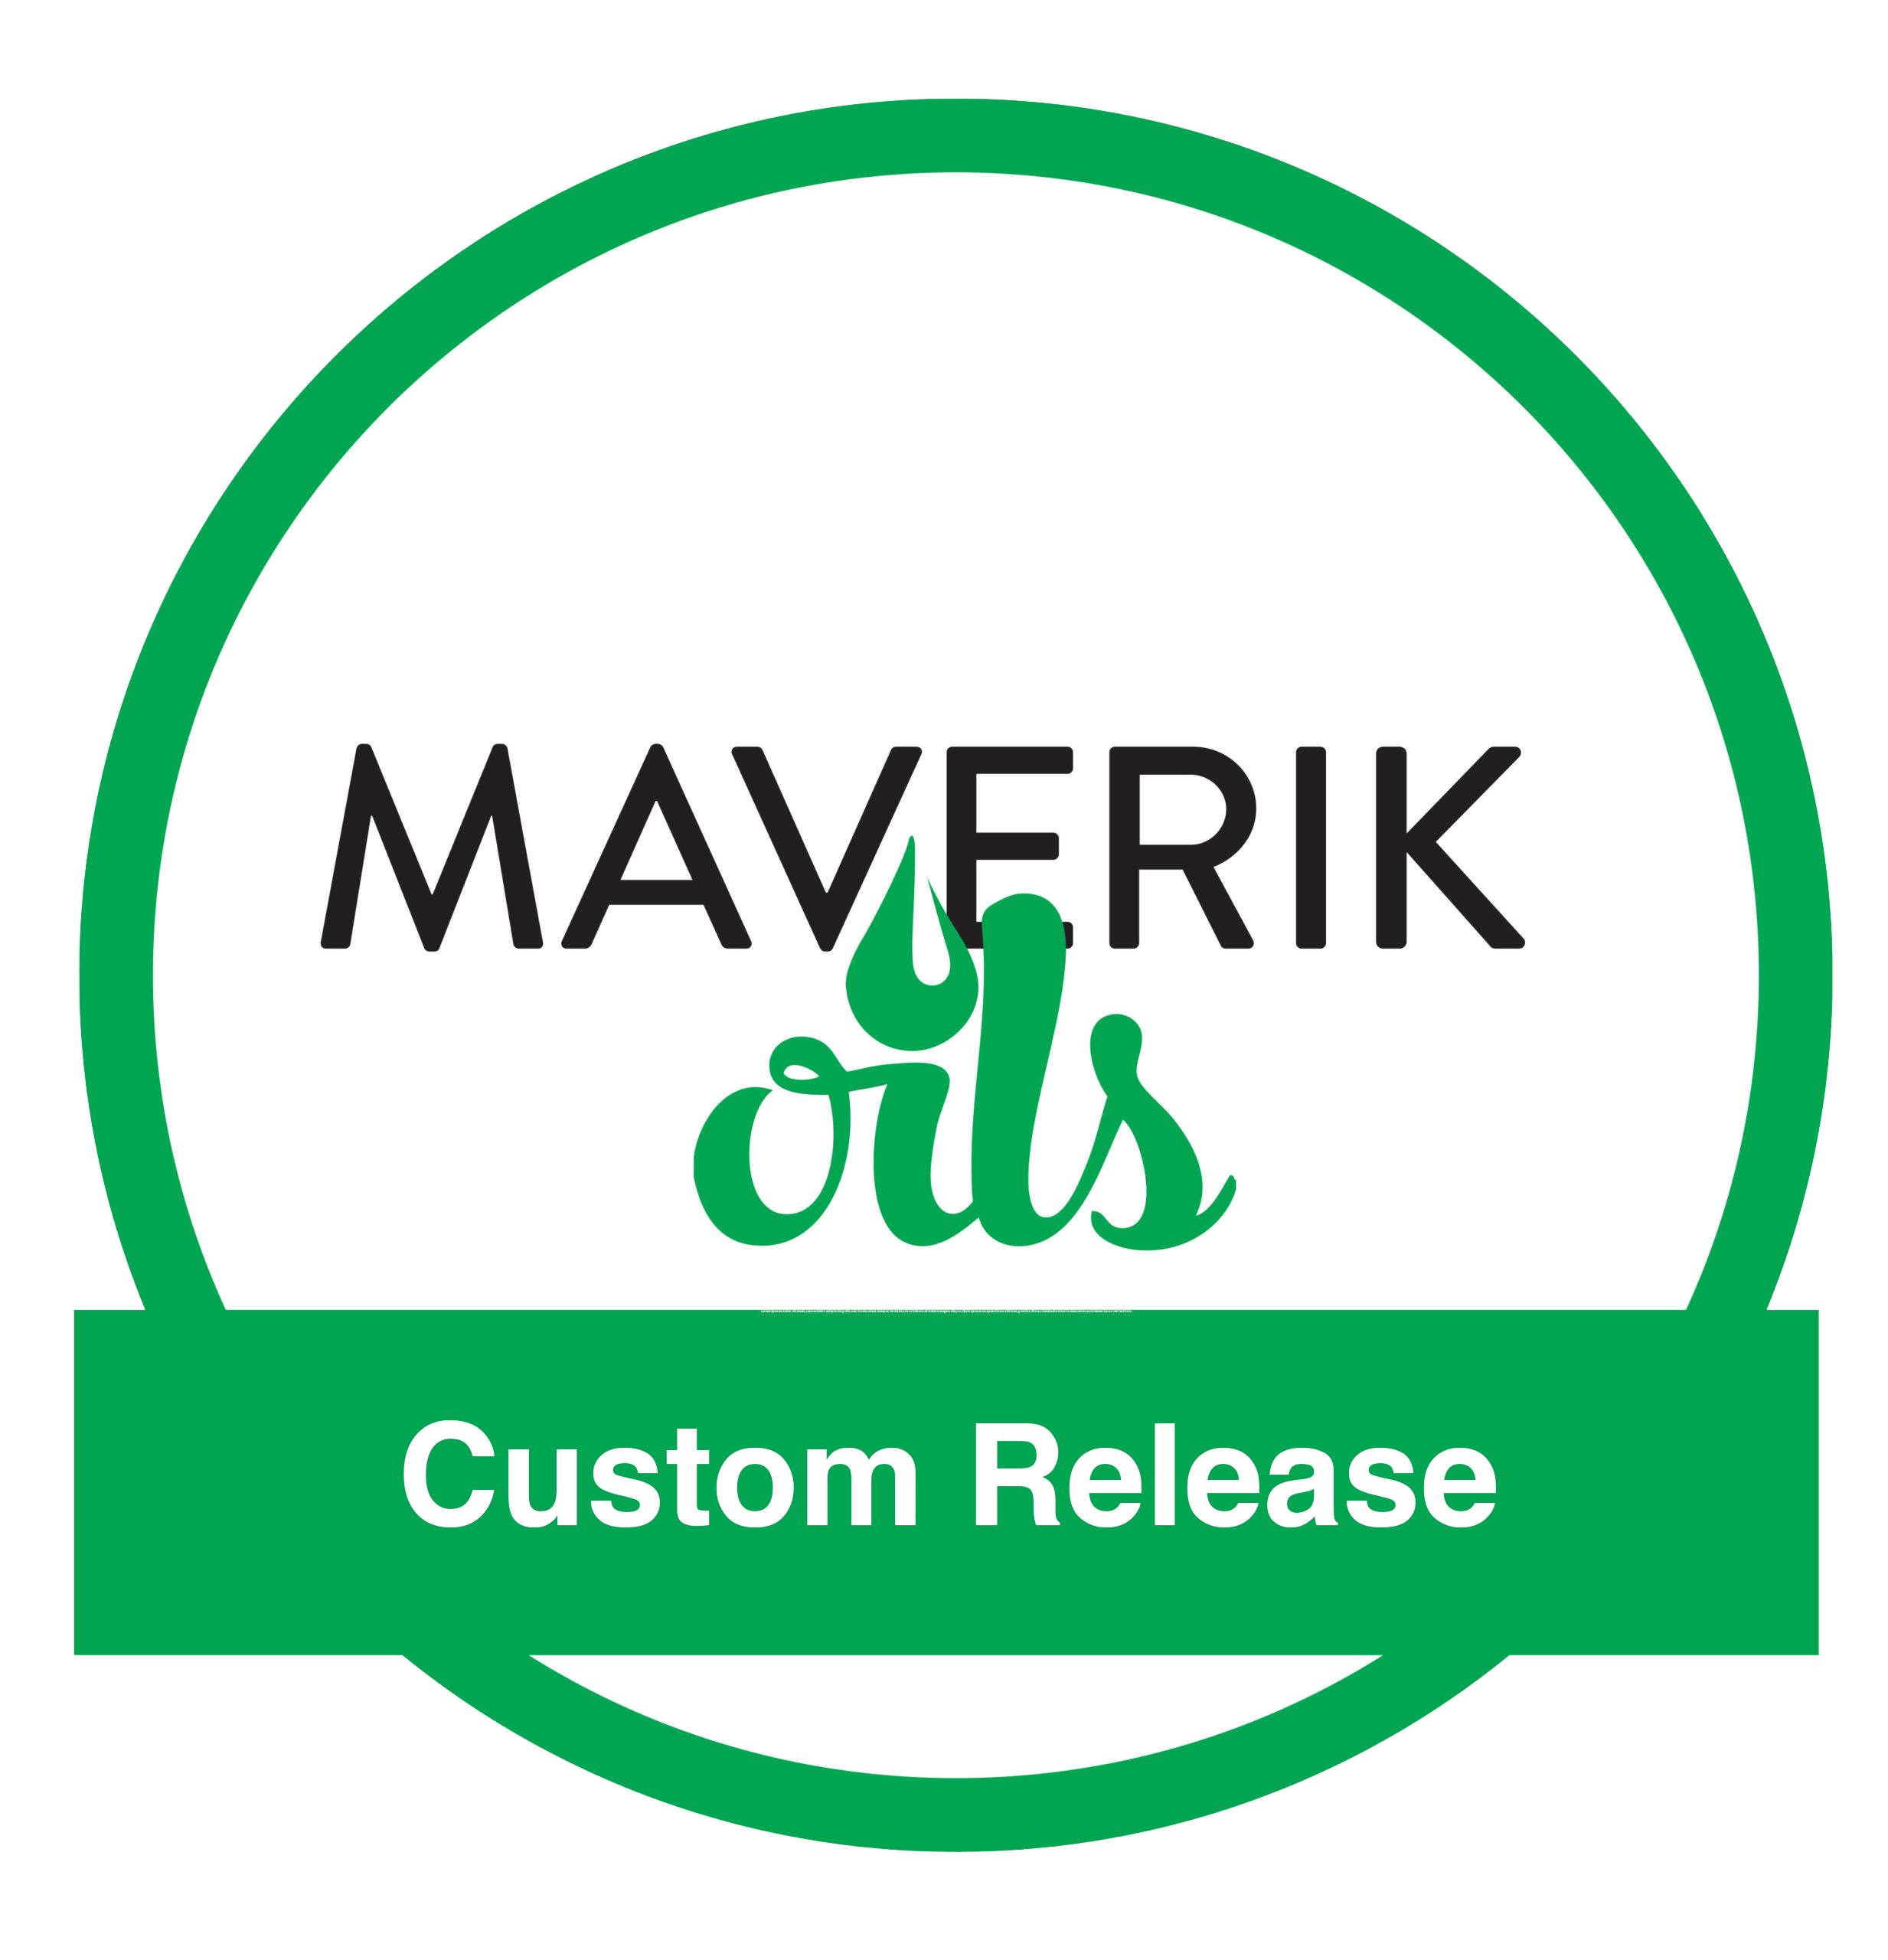 Custom Release